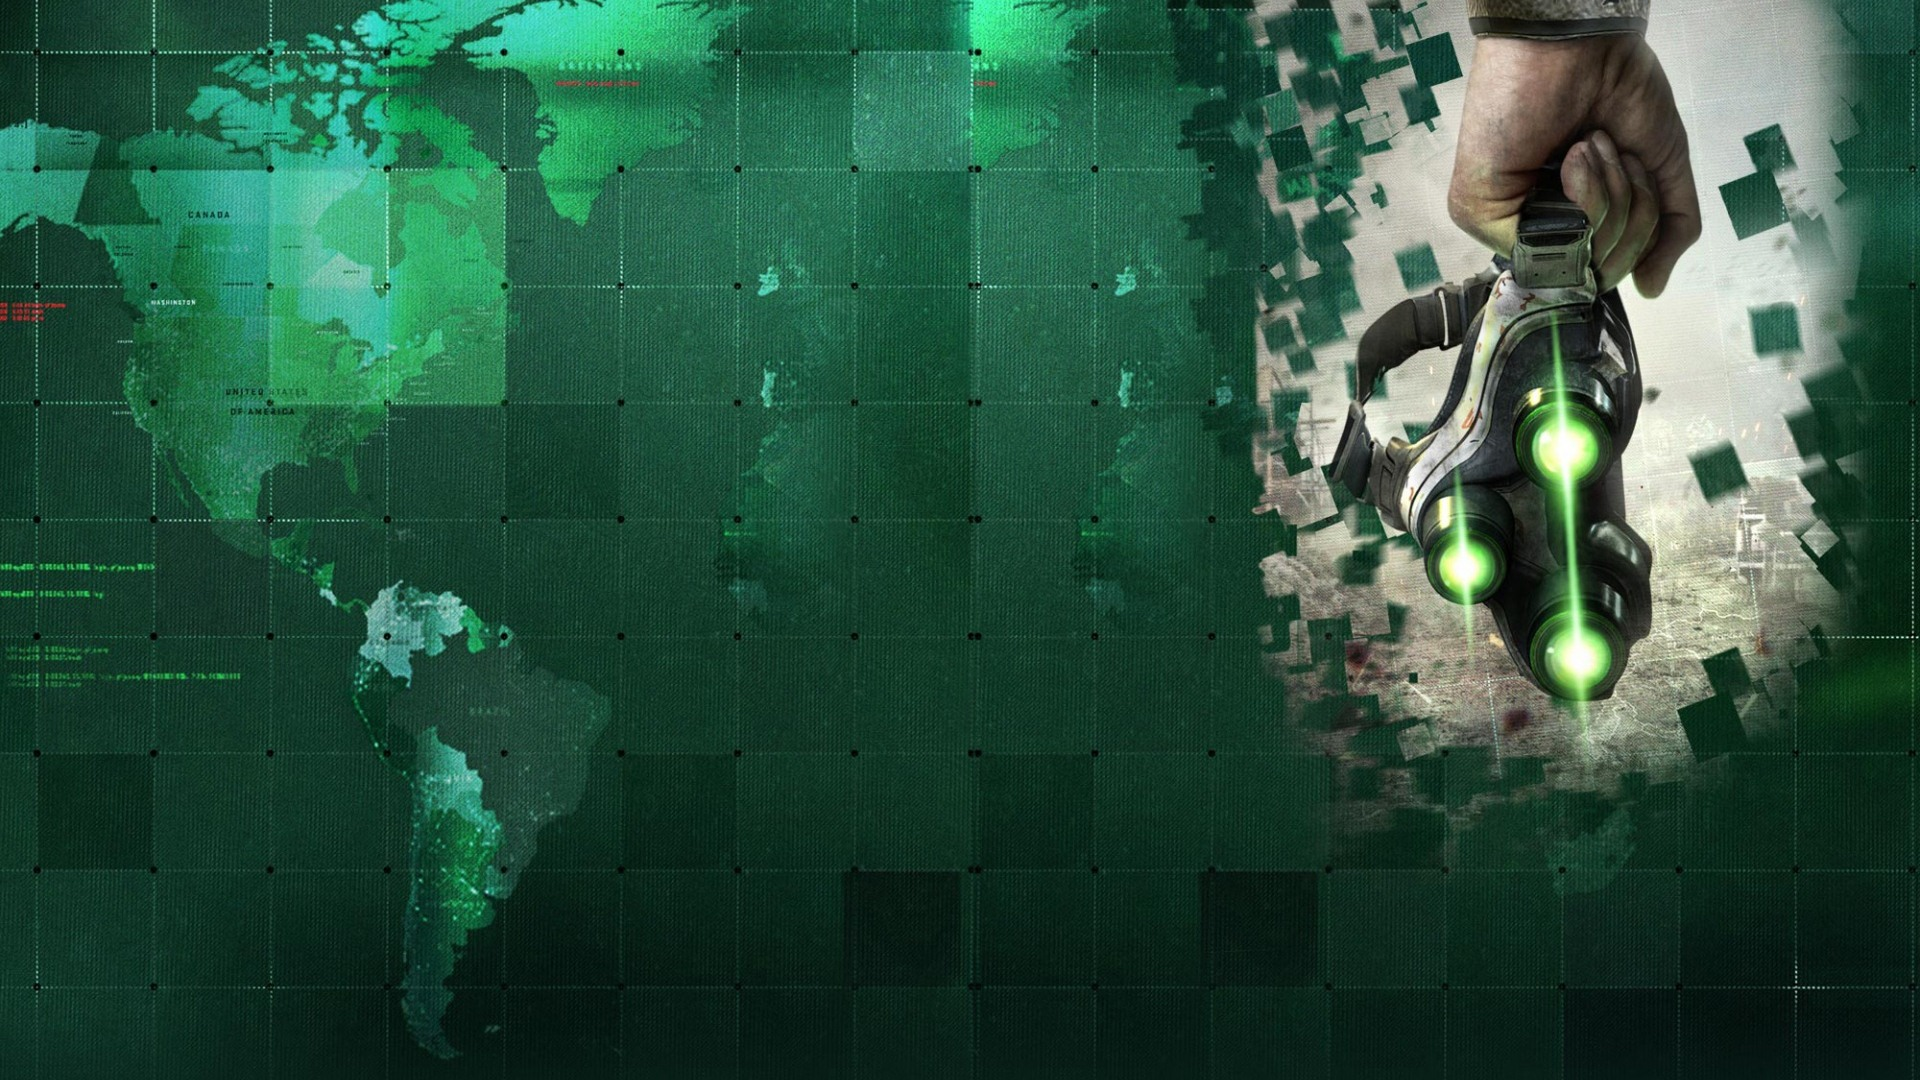 Splinter Cell Blacklist HD Wallpapers 12